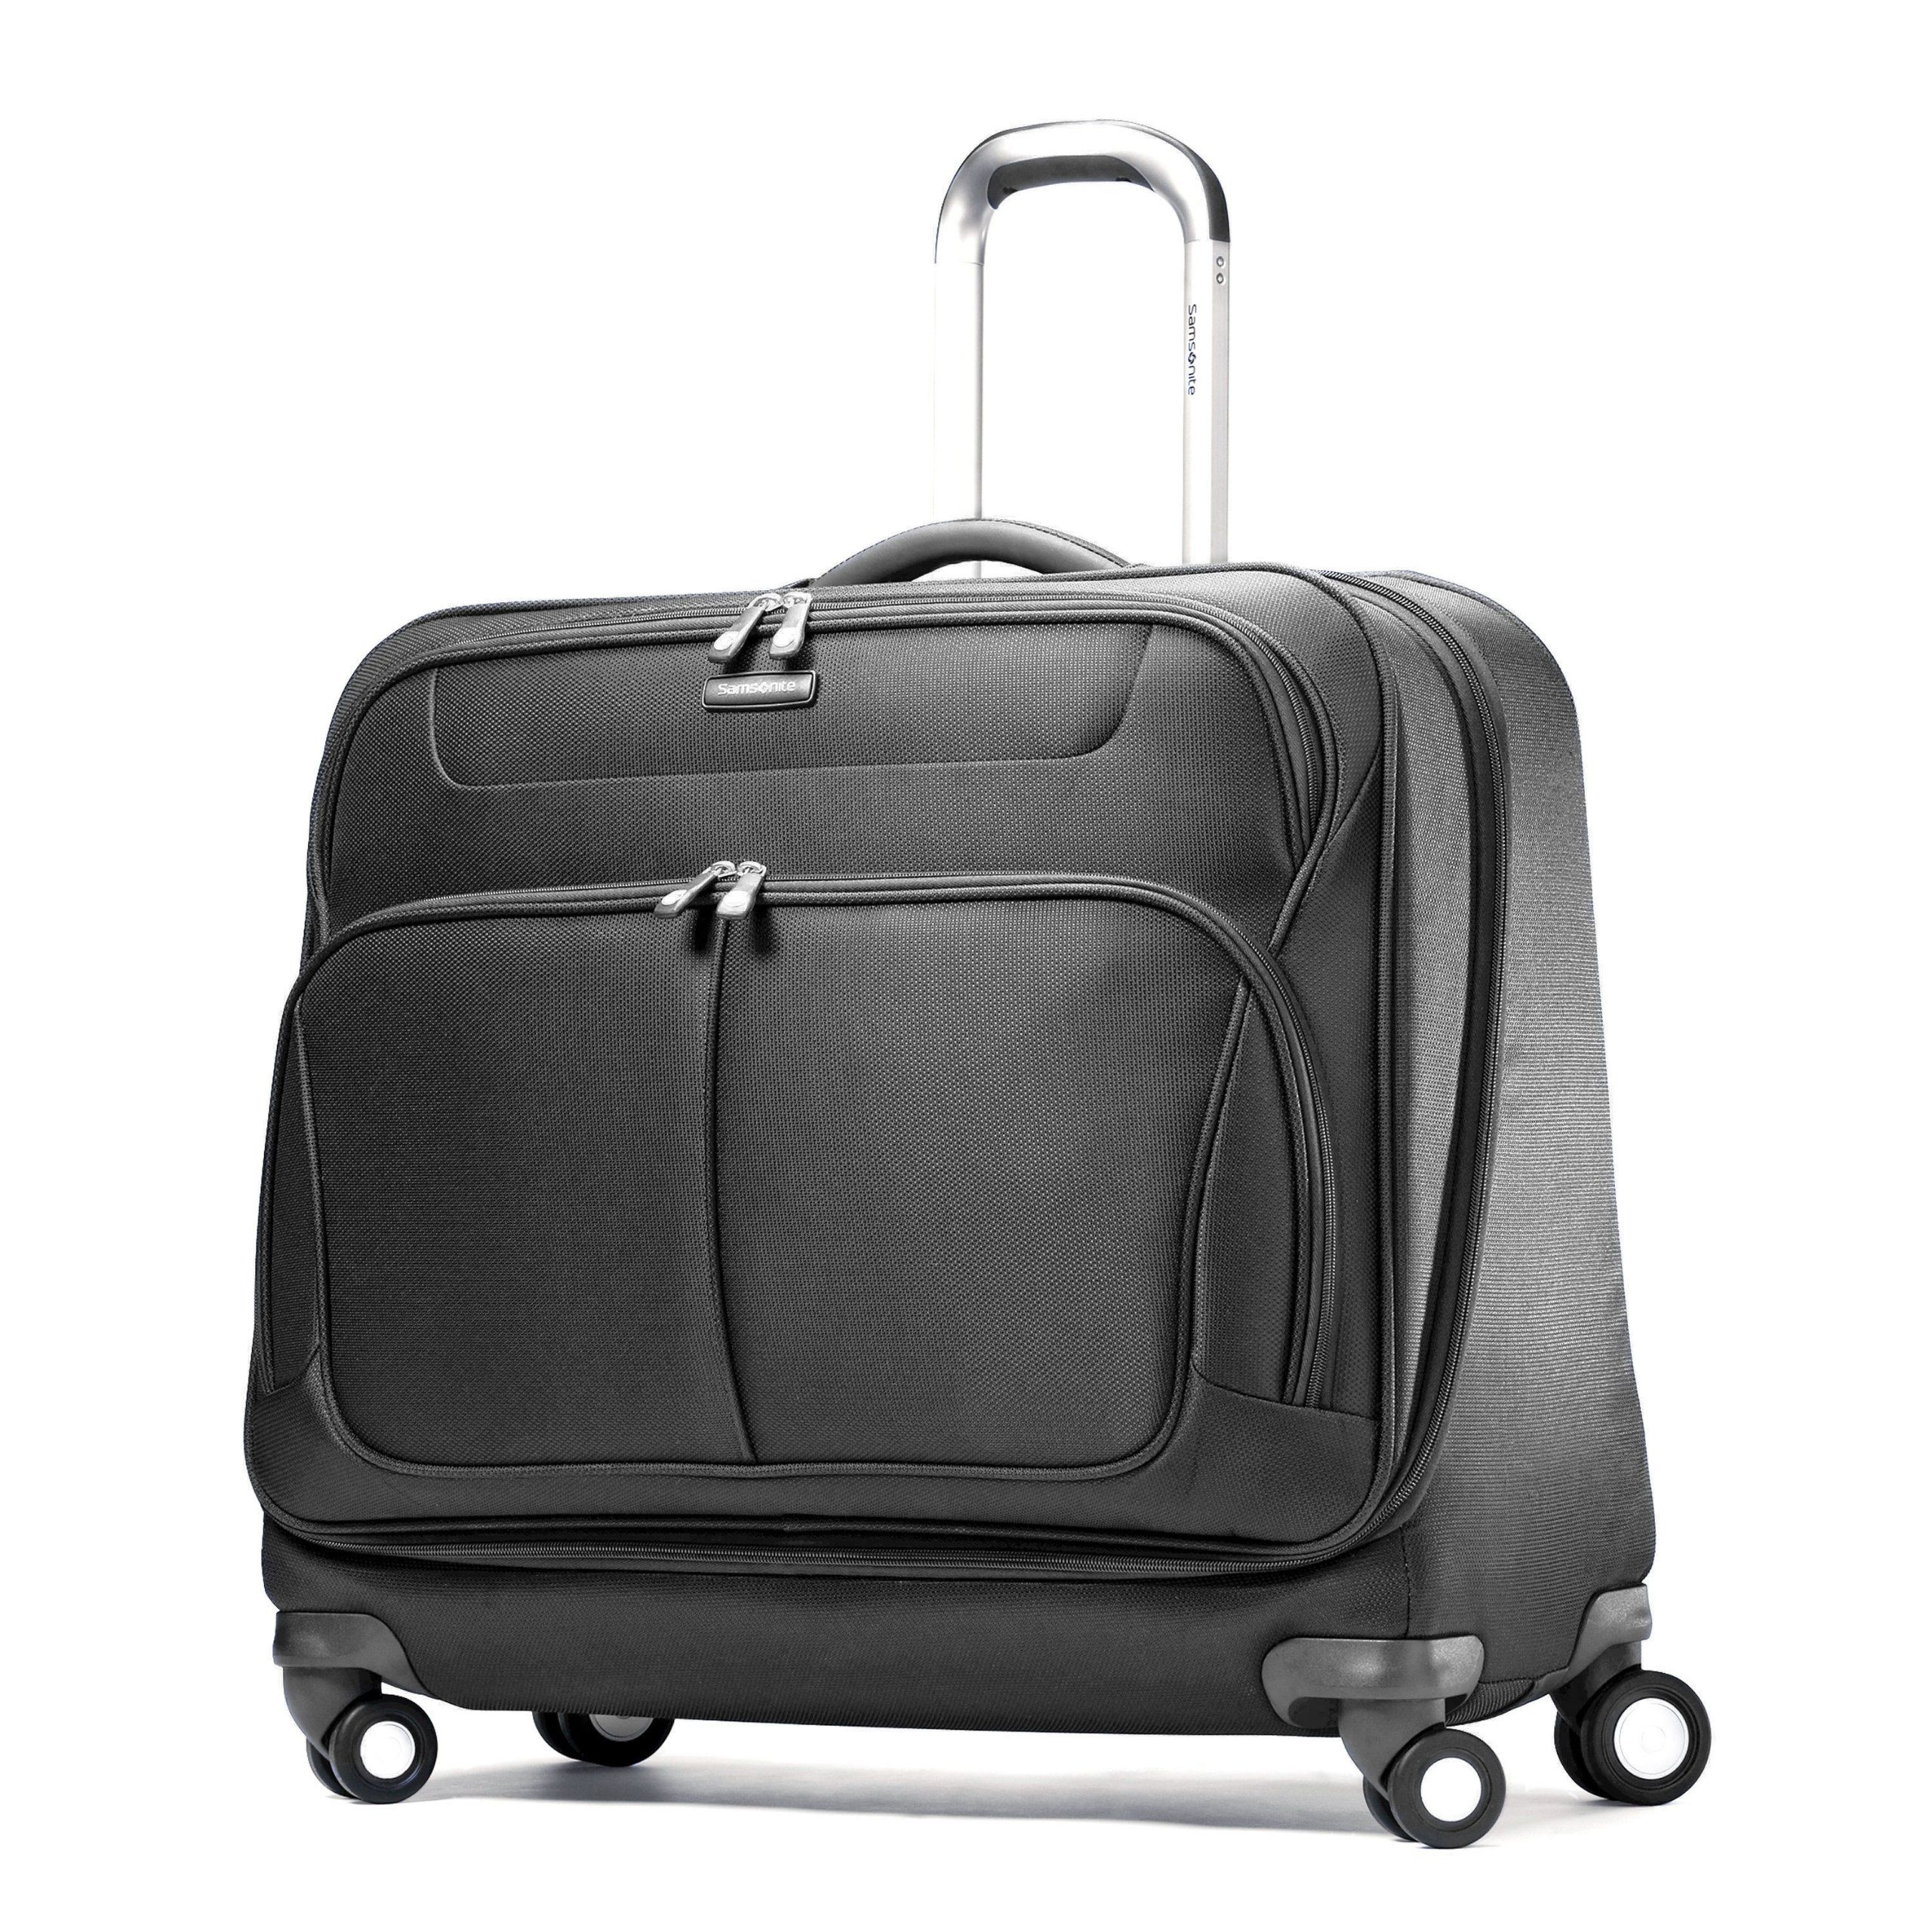 Samsonite Hypere Spinner Garment Bag Grey Exclusive